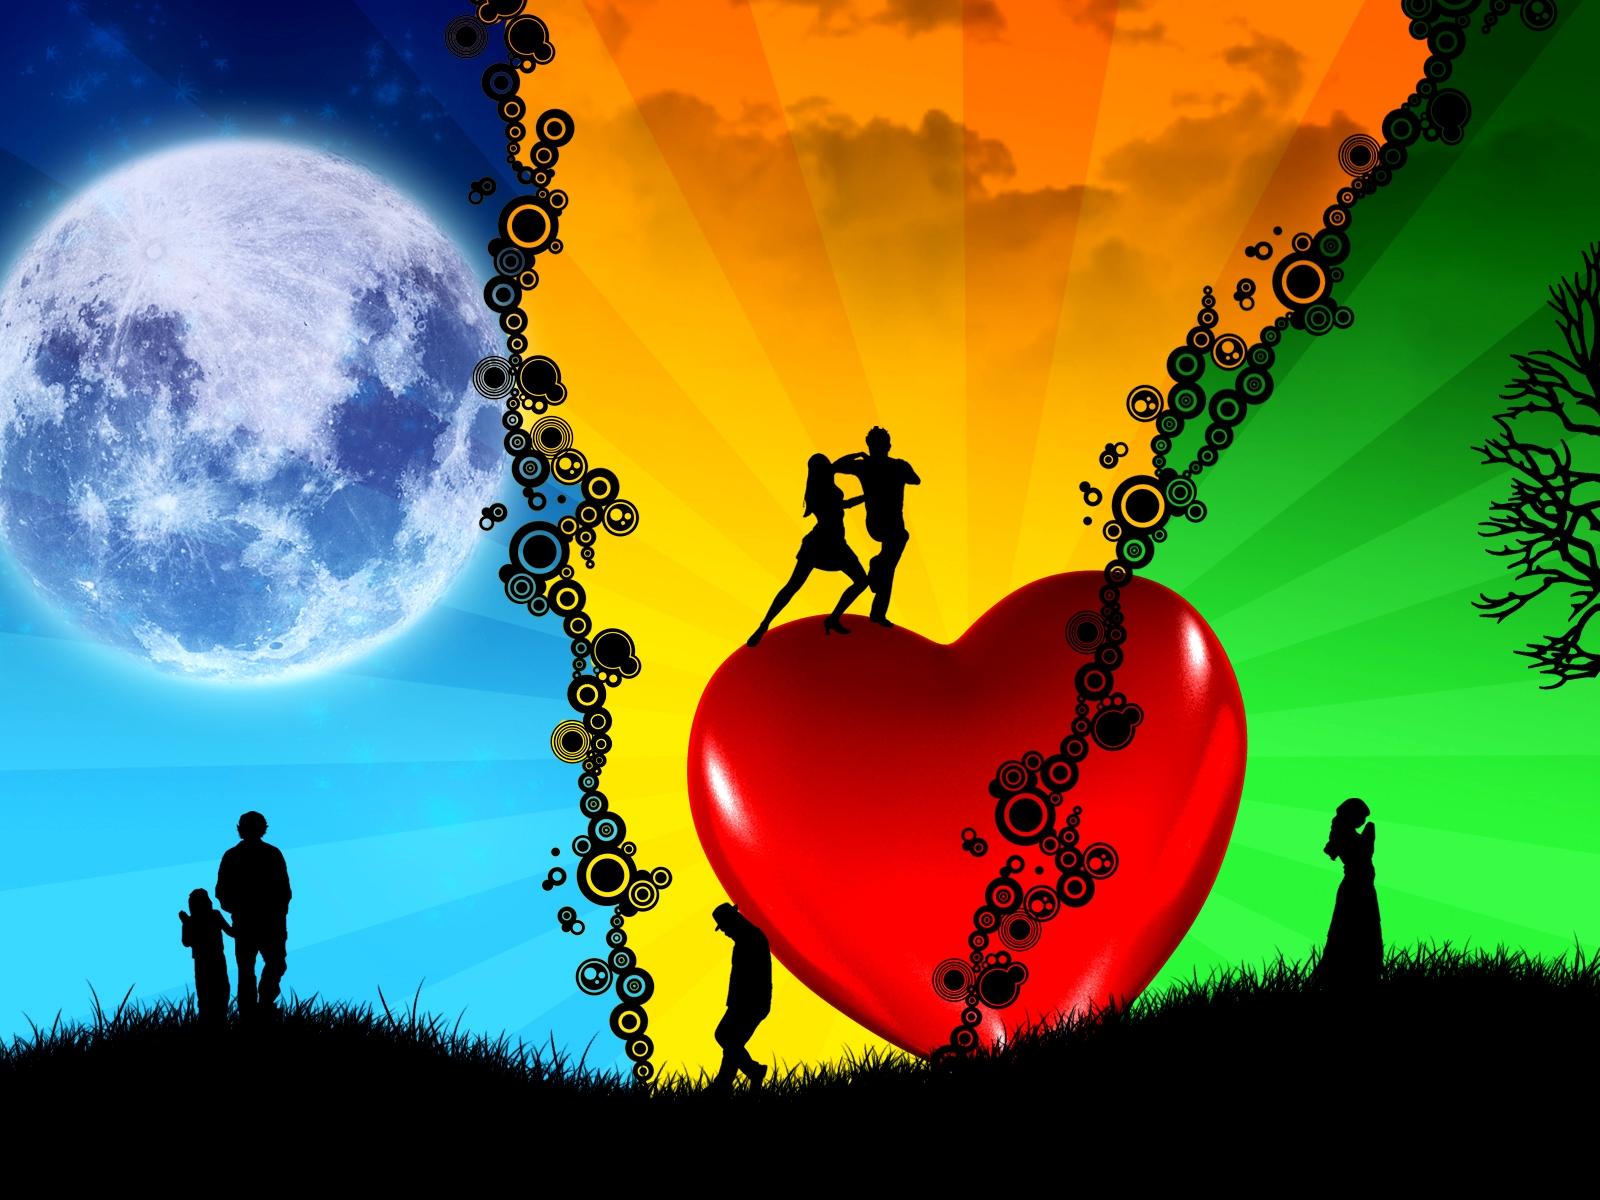 Love Wallpaper HD: Love Pics Wallpapers